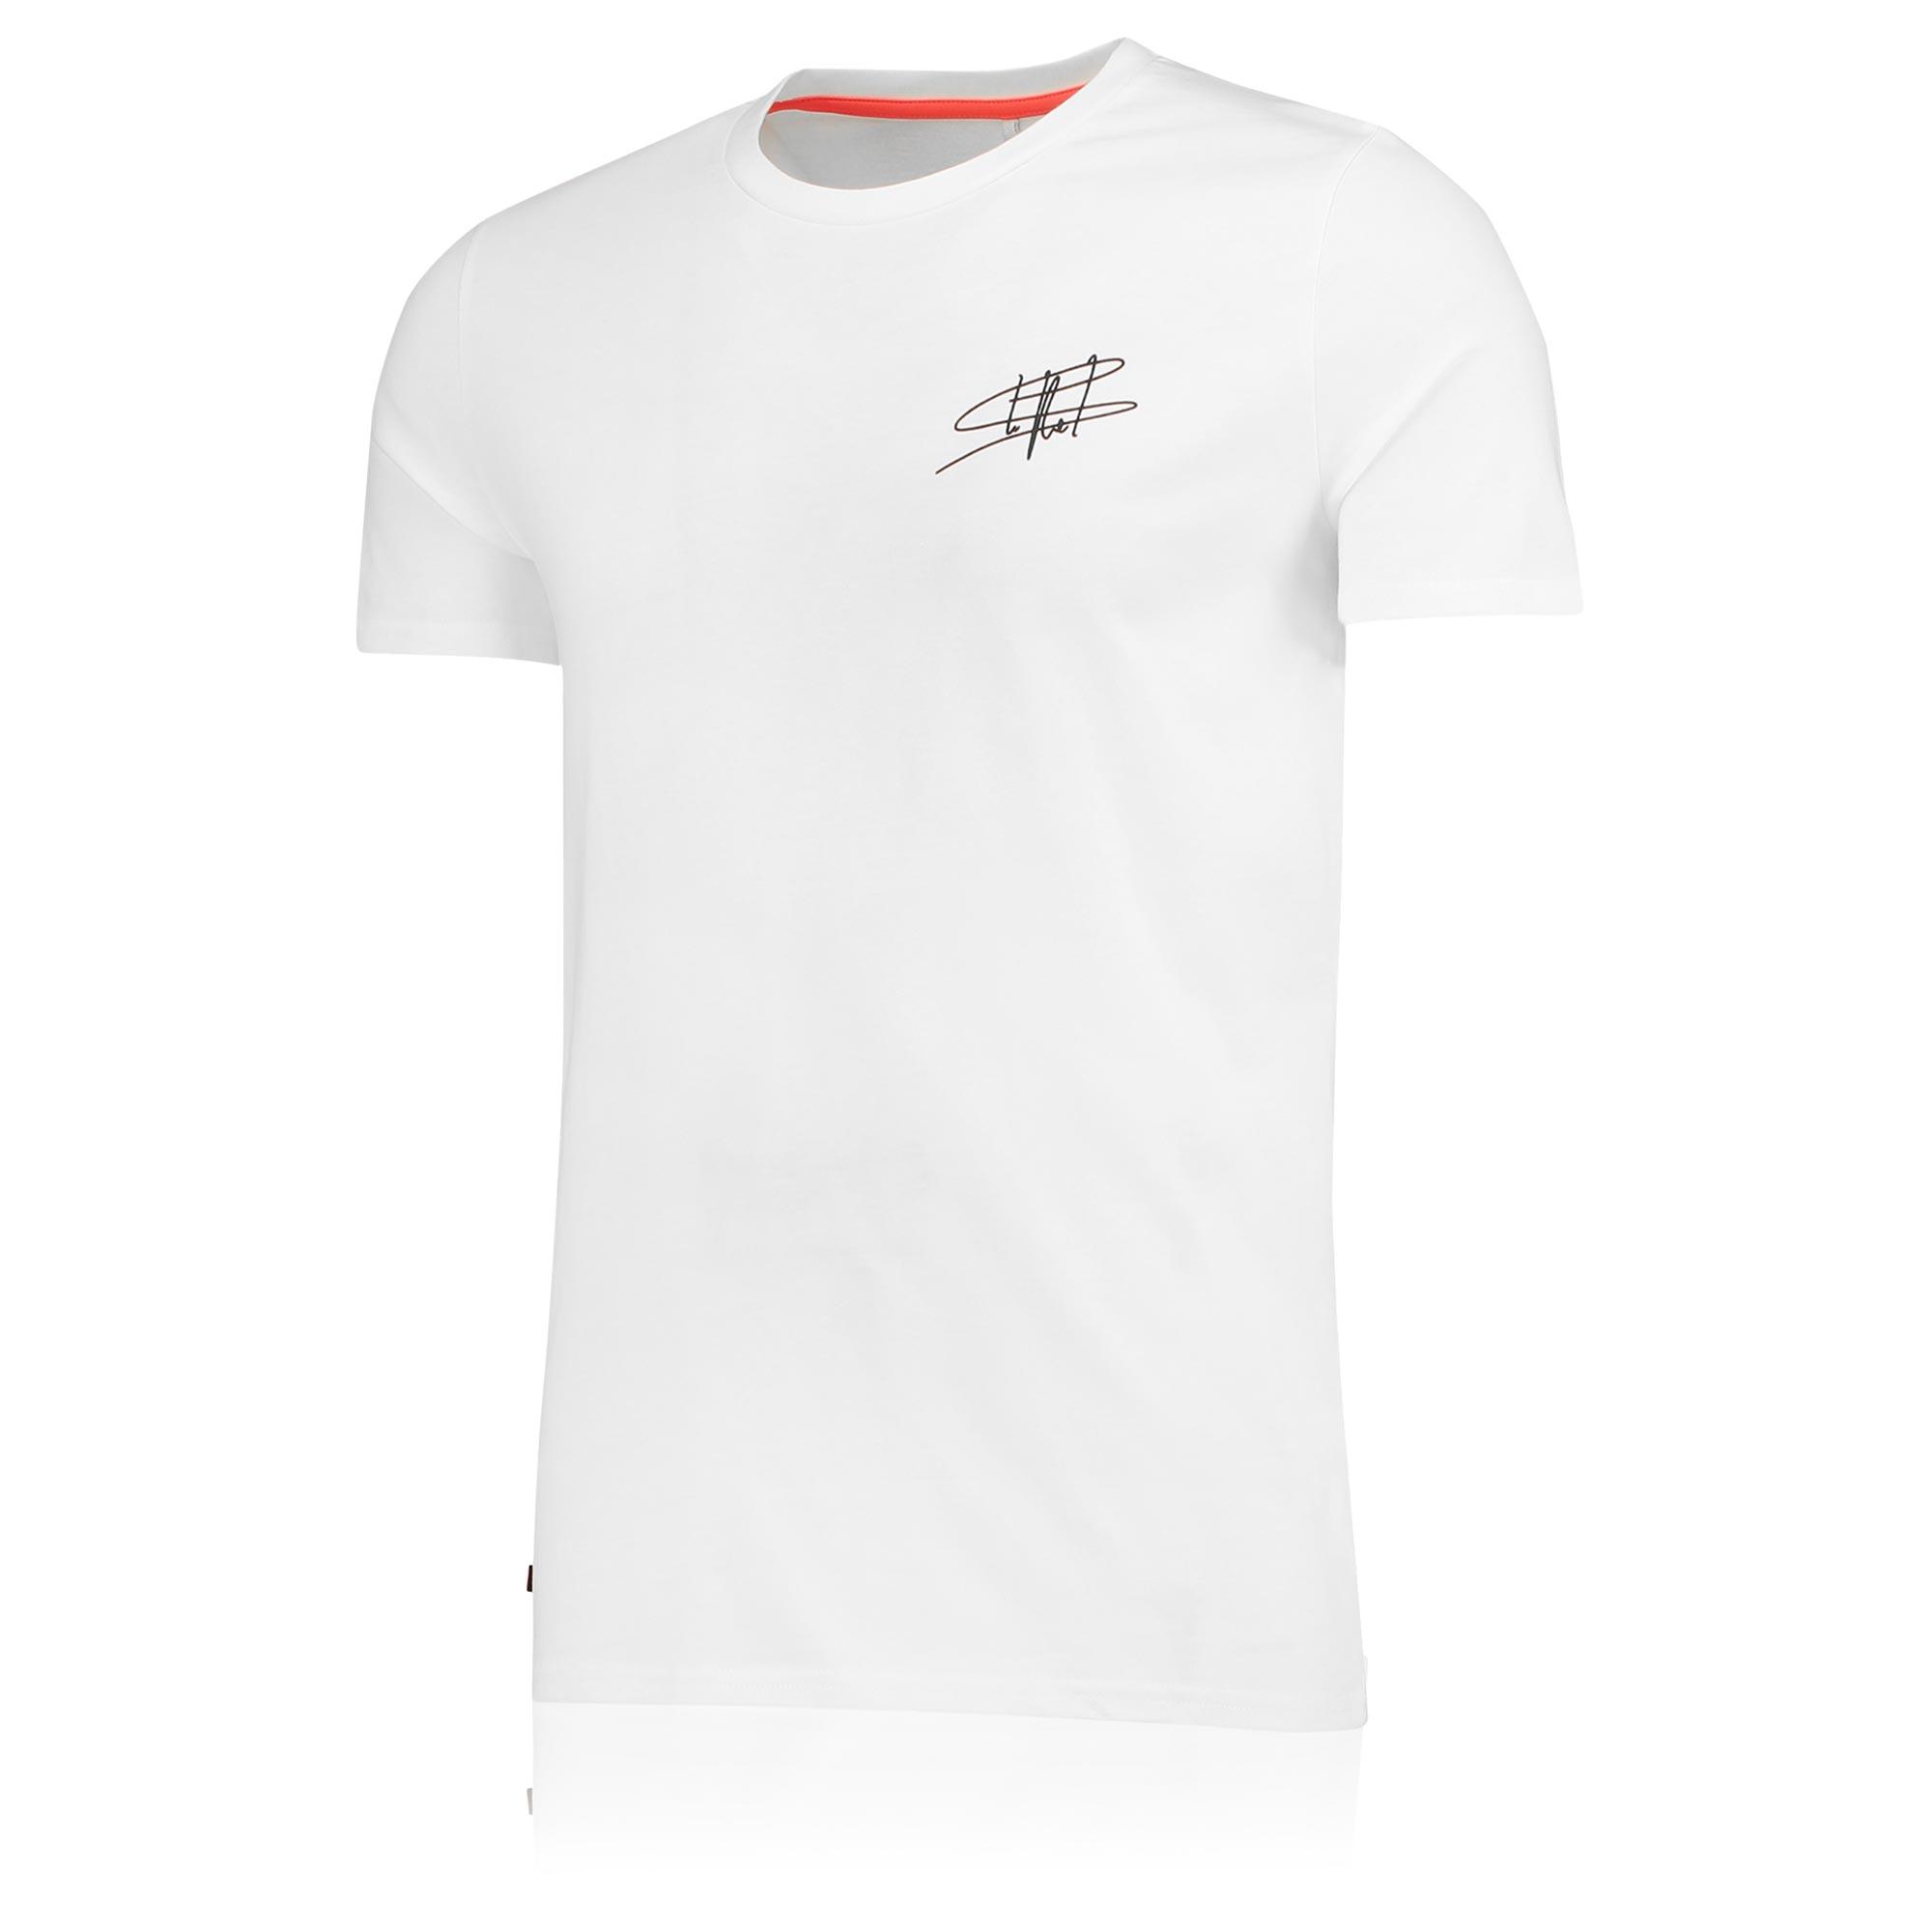 McLaren Honda Stoffel2 2017 T-Shirt - White